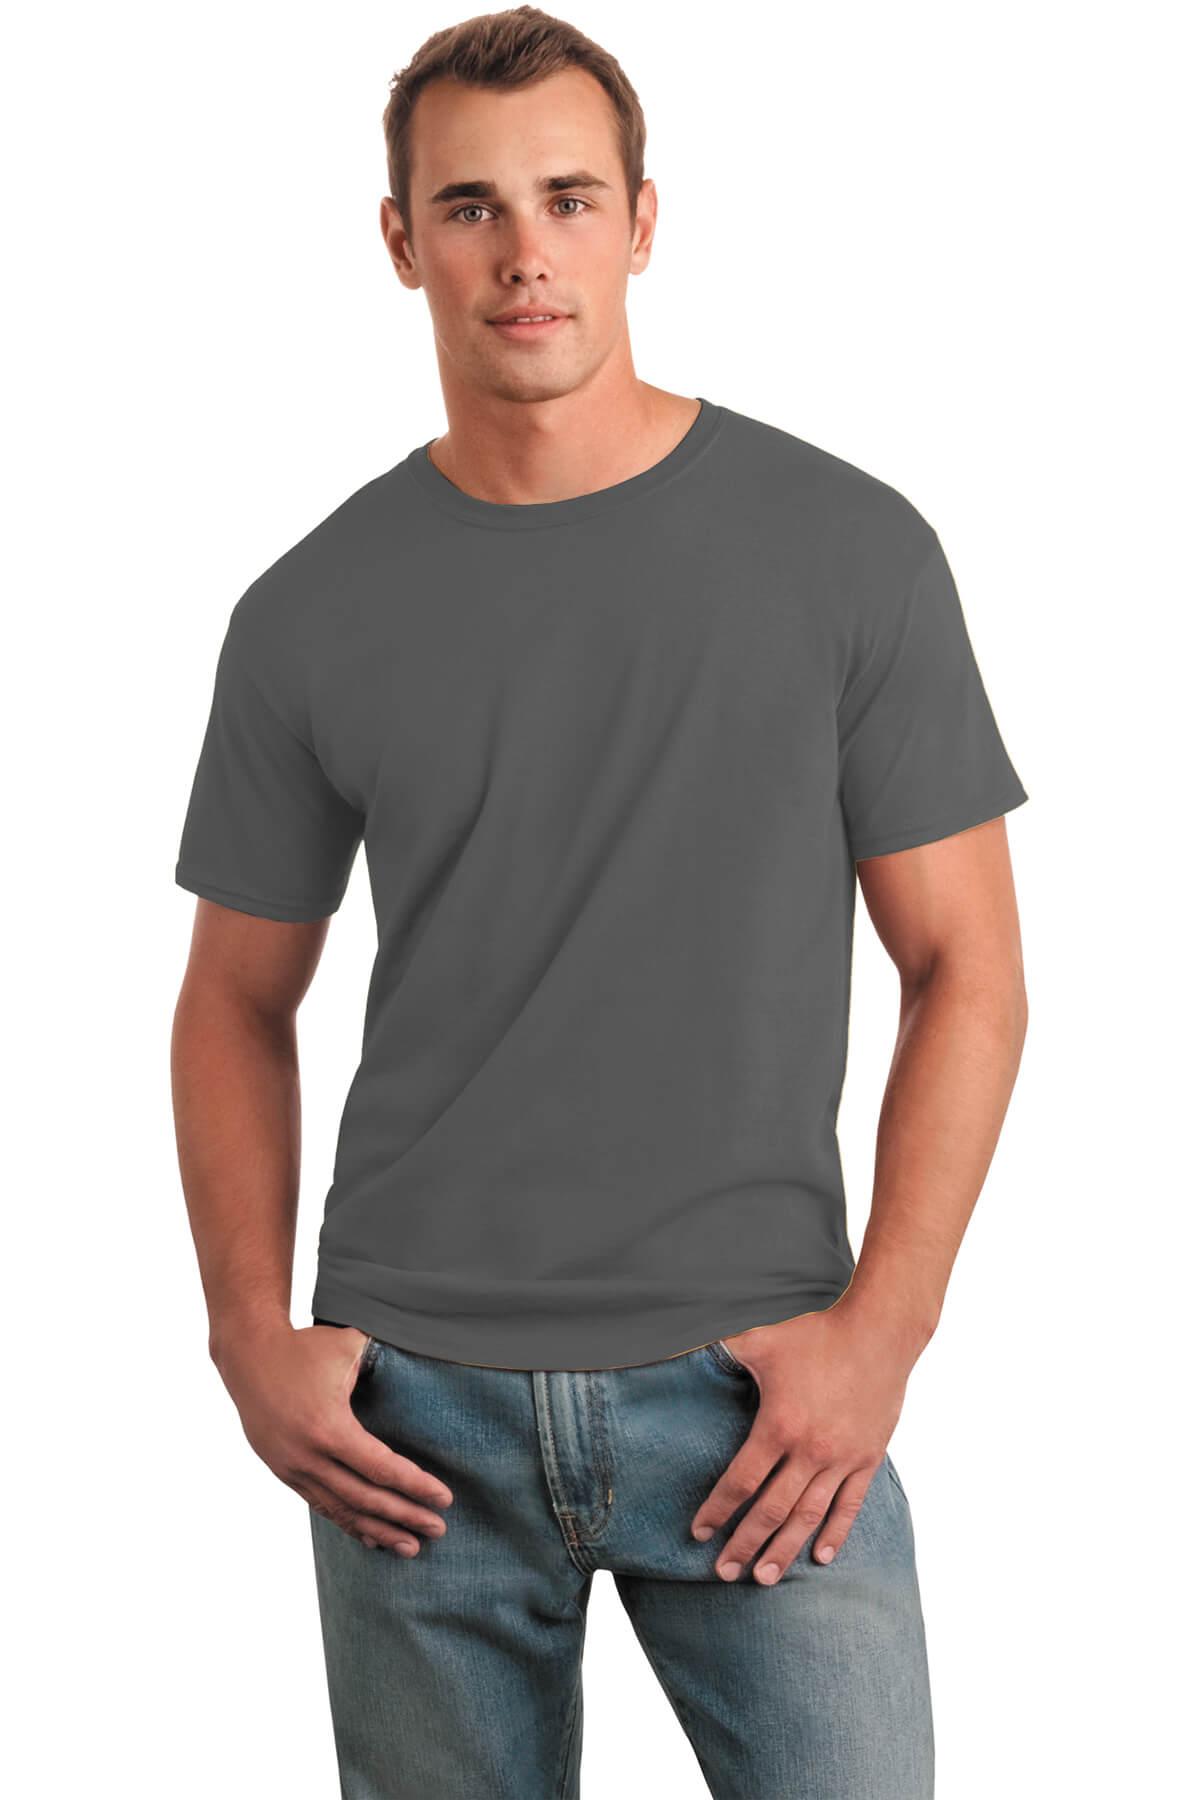 Charcoal T-Shirt Model Front